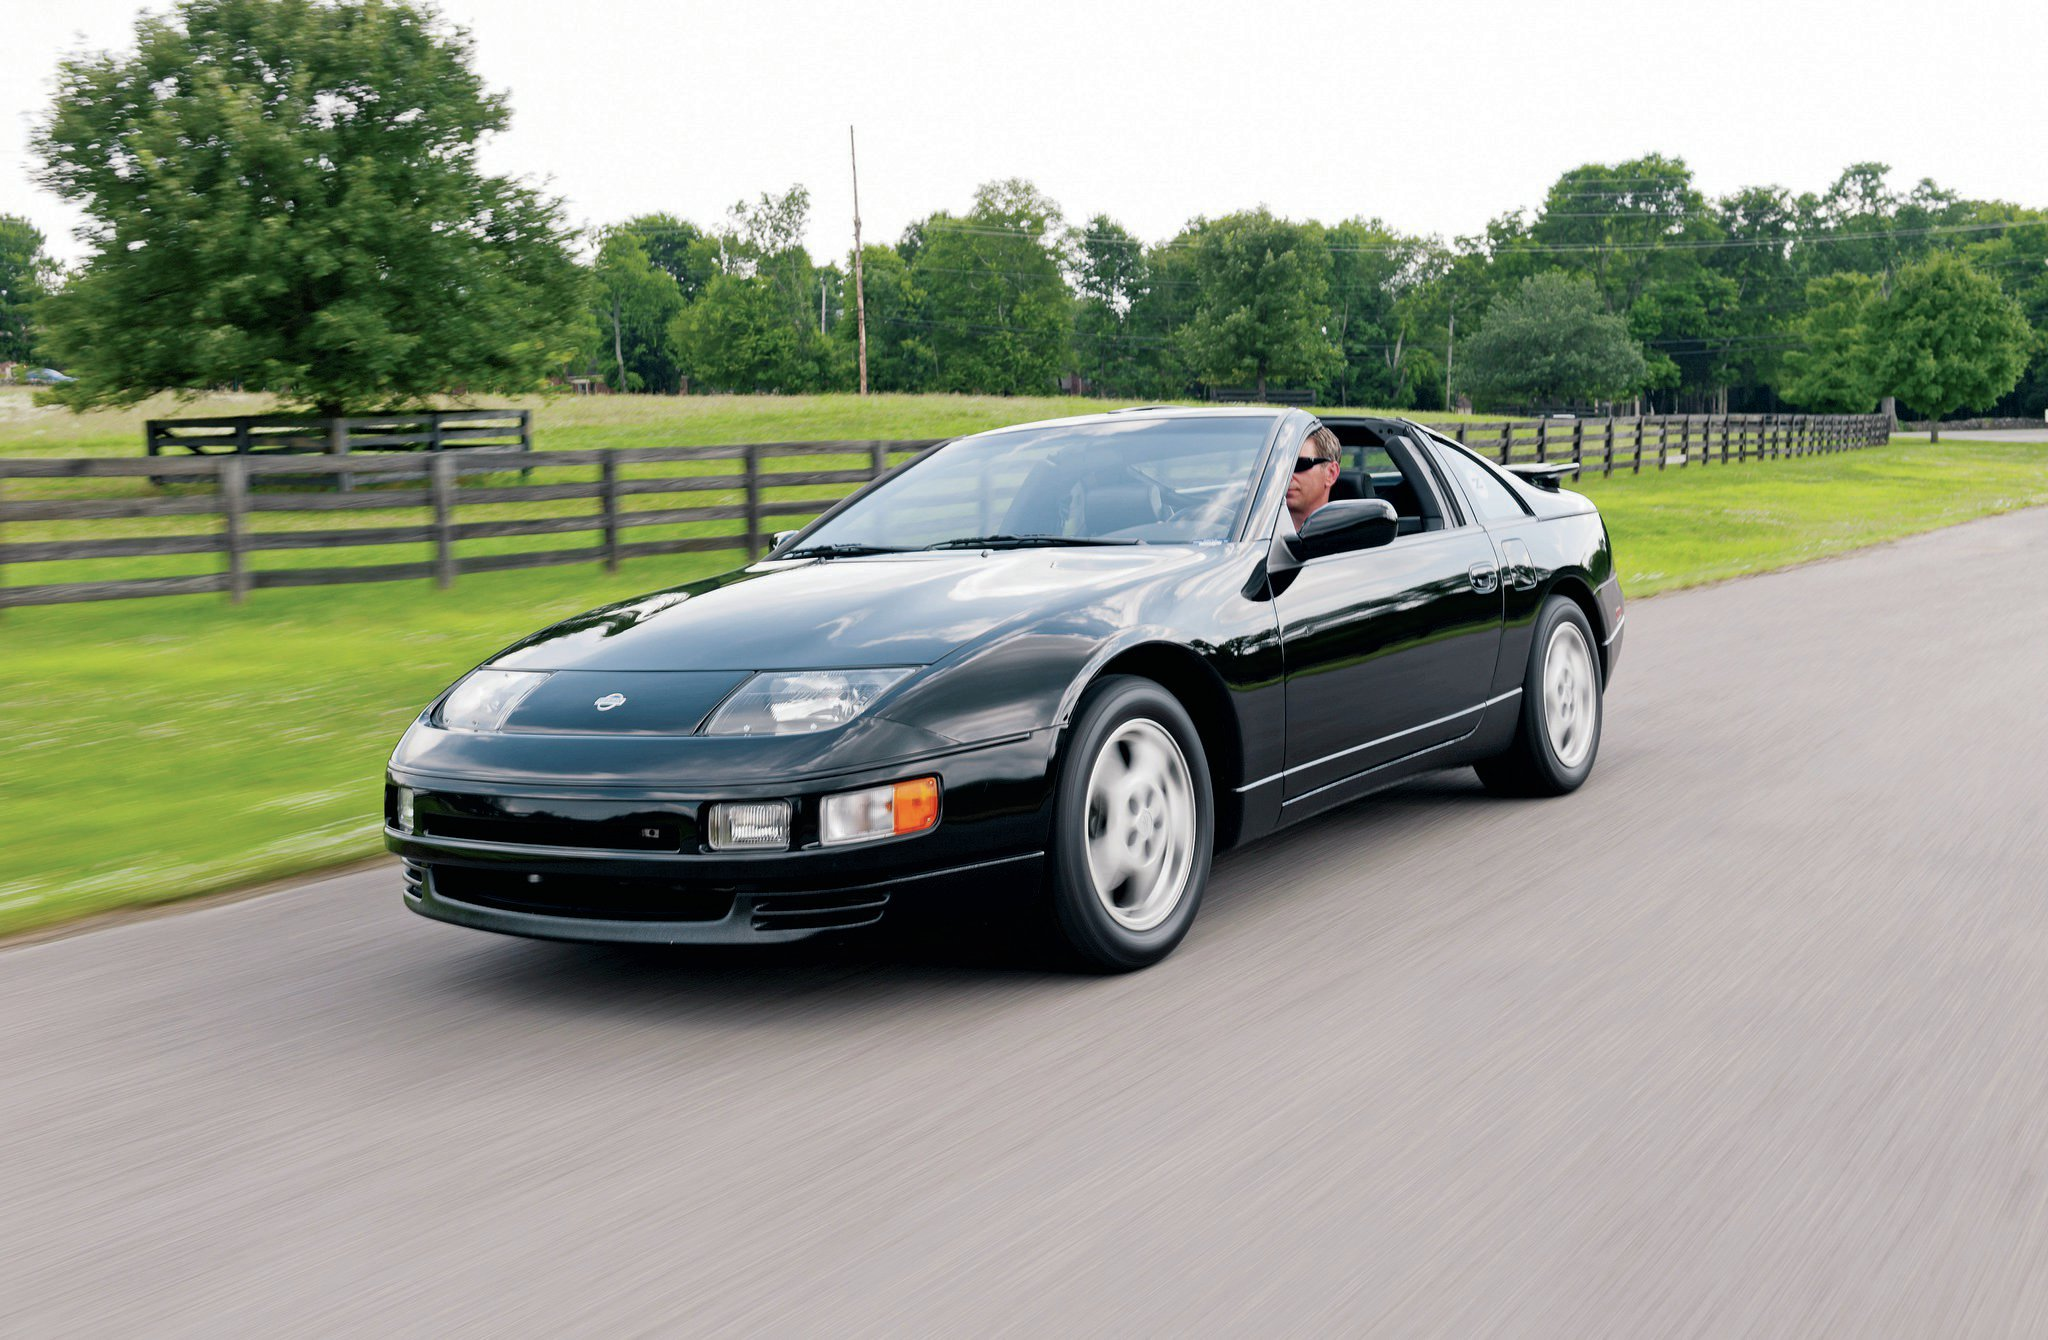 Collectible Classic: 1990-1996 Nissan 300ZXAutomobile Magazine